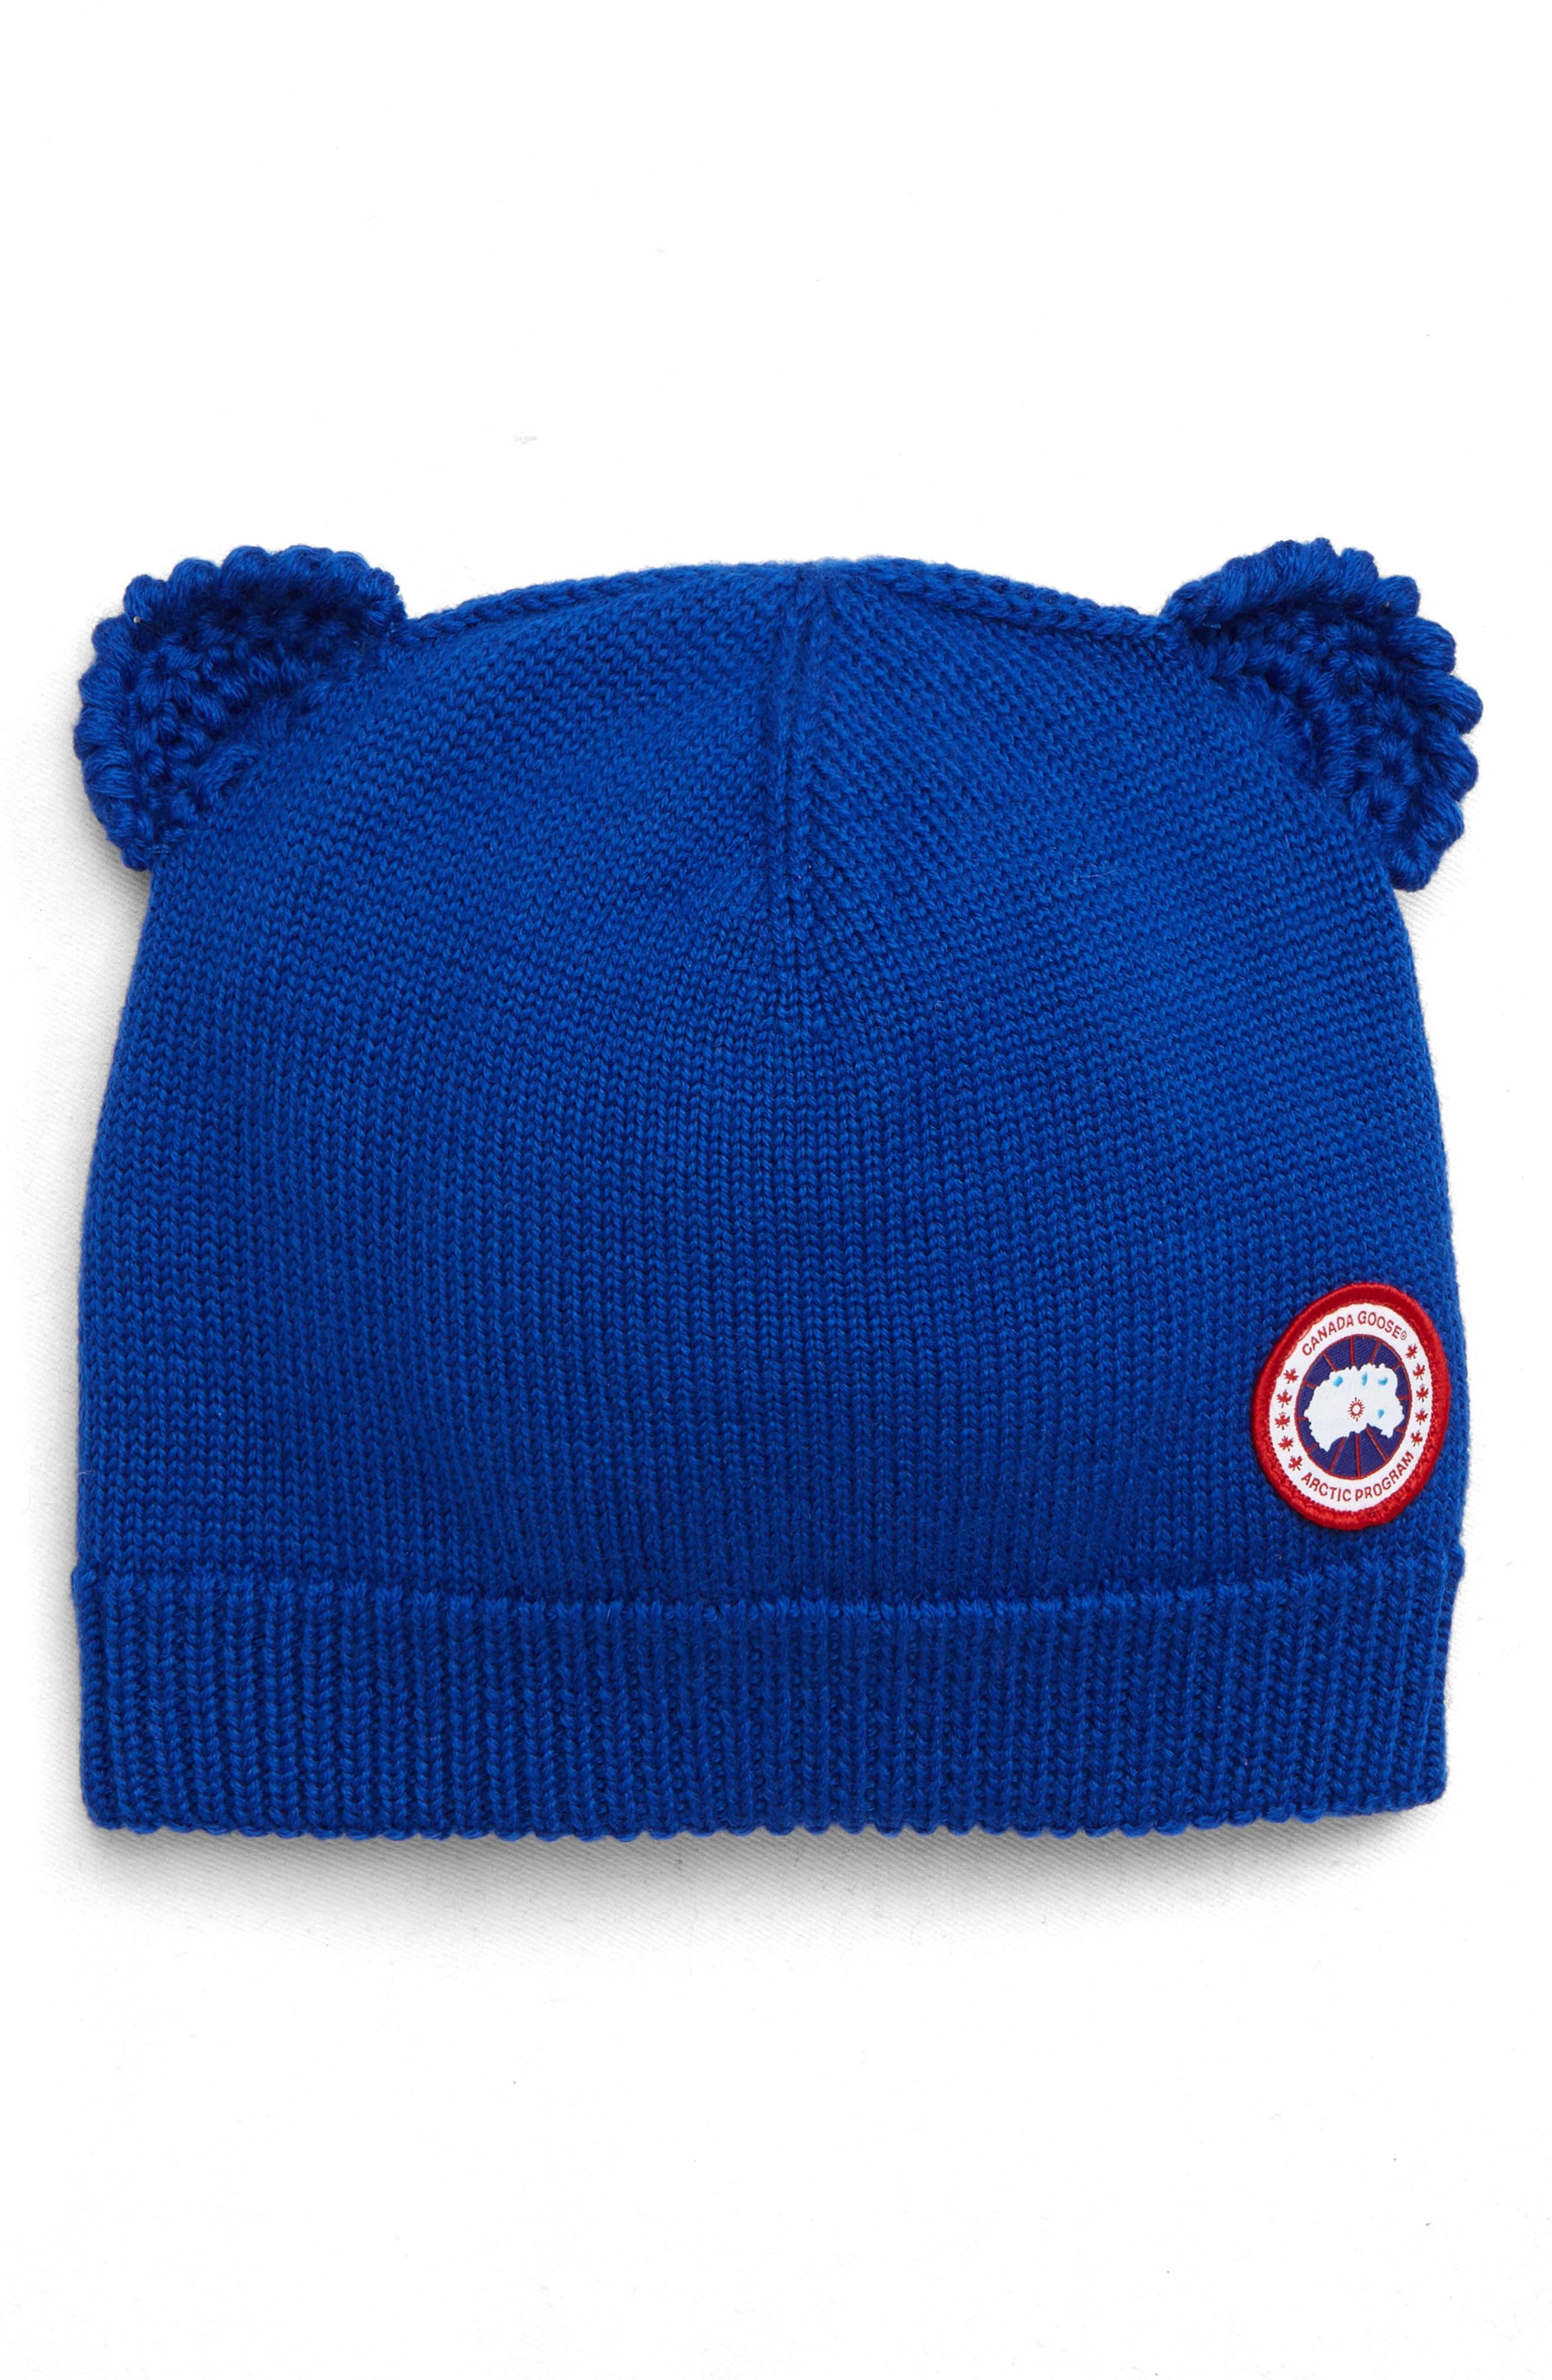 Toddler Canada Goose Cub Wool Hat - Blue